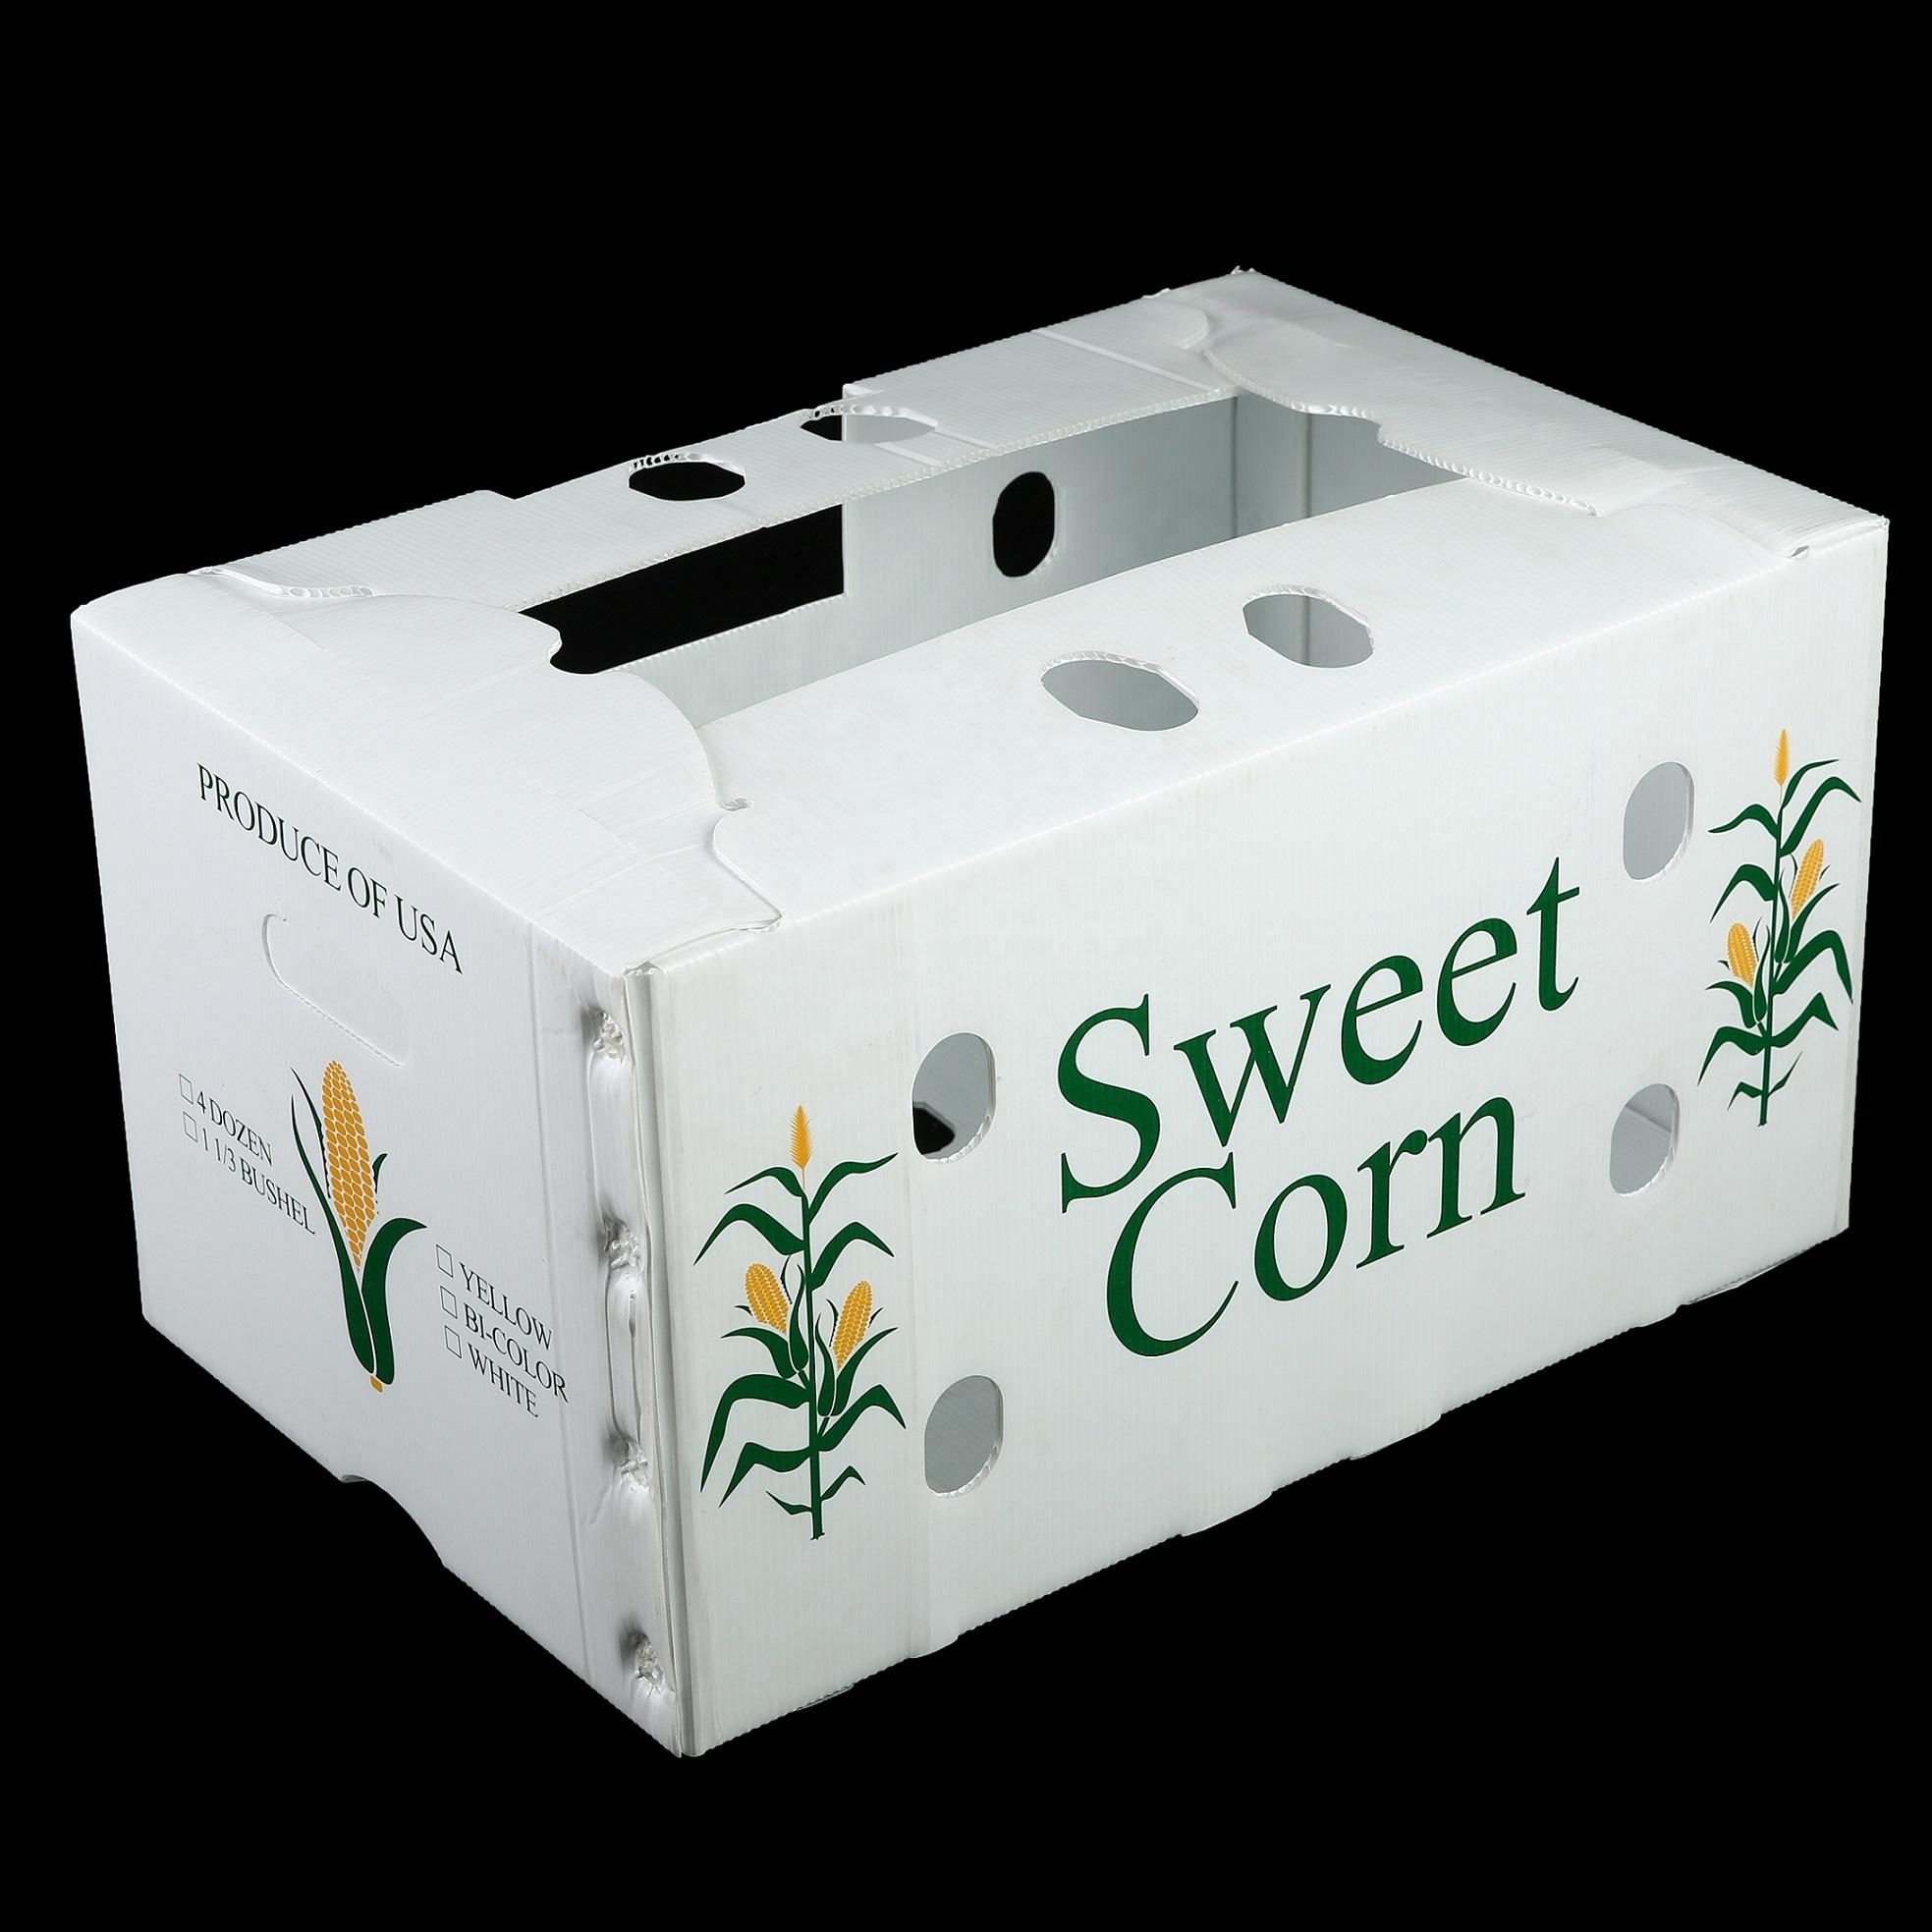 Polypropylene Corrugated Plastic coroplast Box plastic Sheet Fruit vegetable box